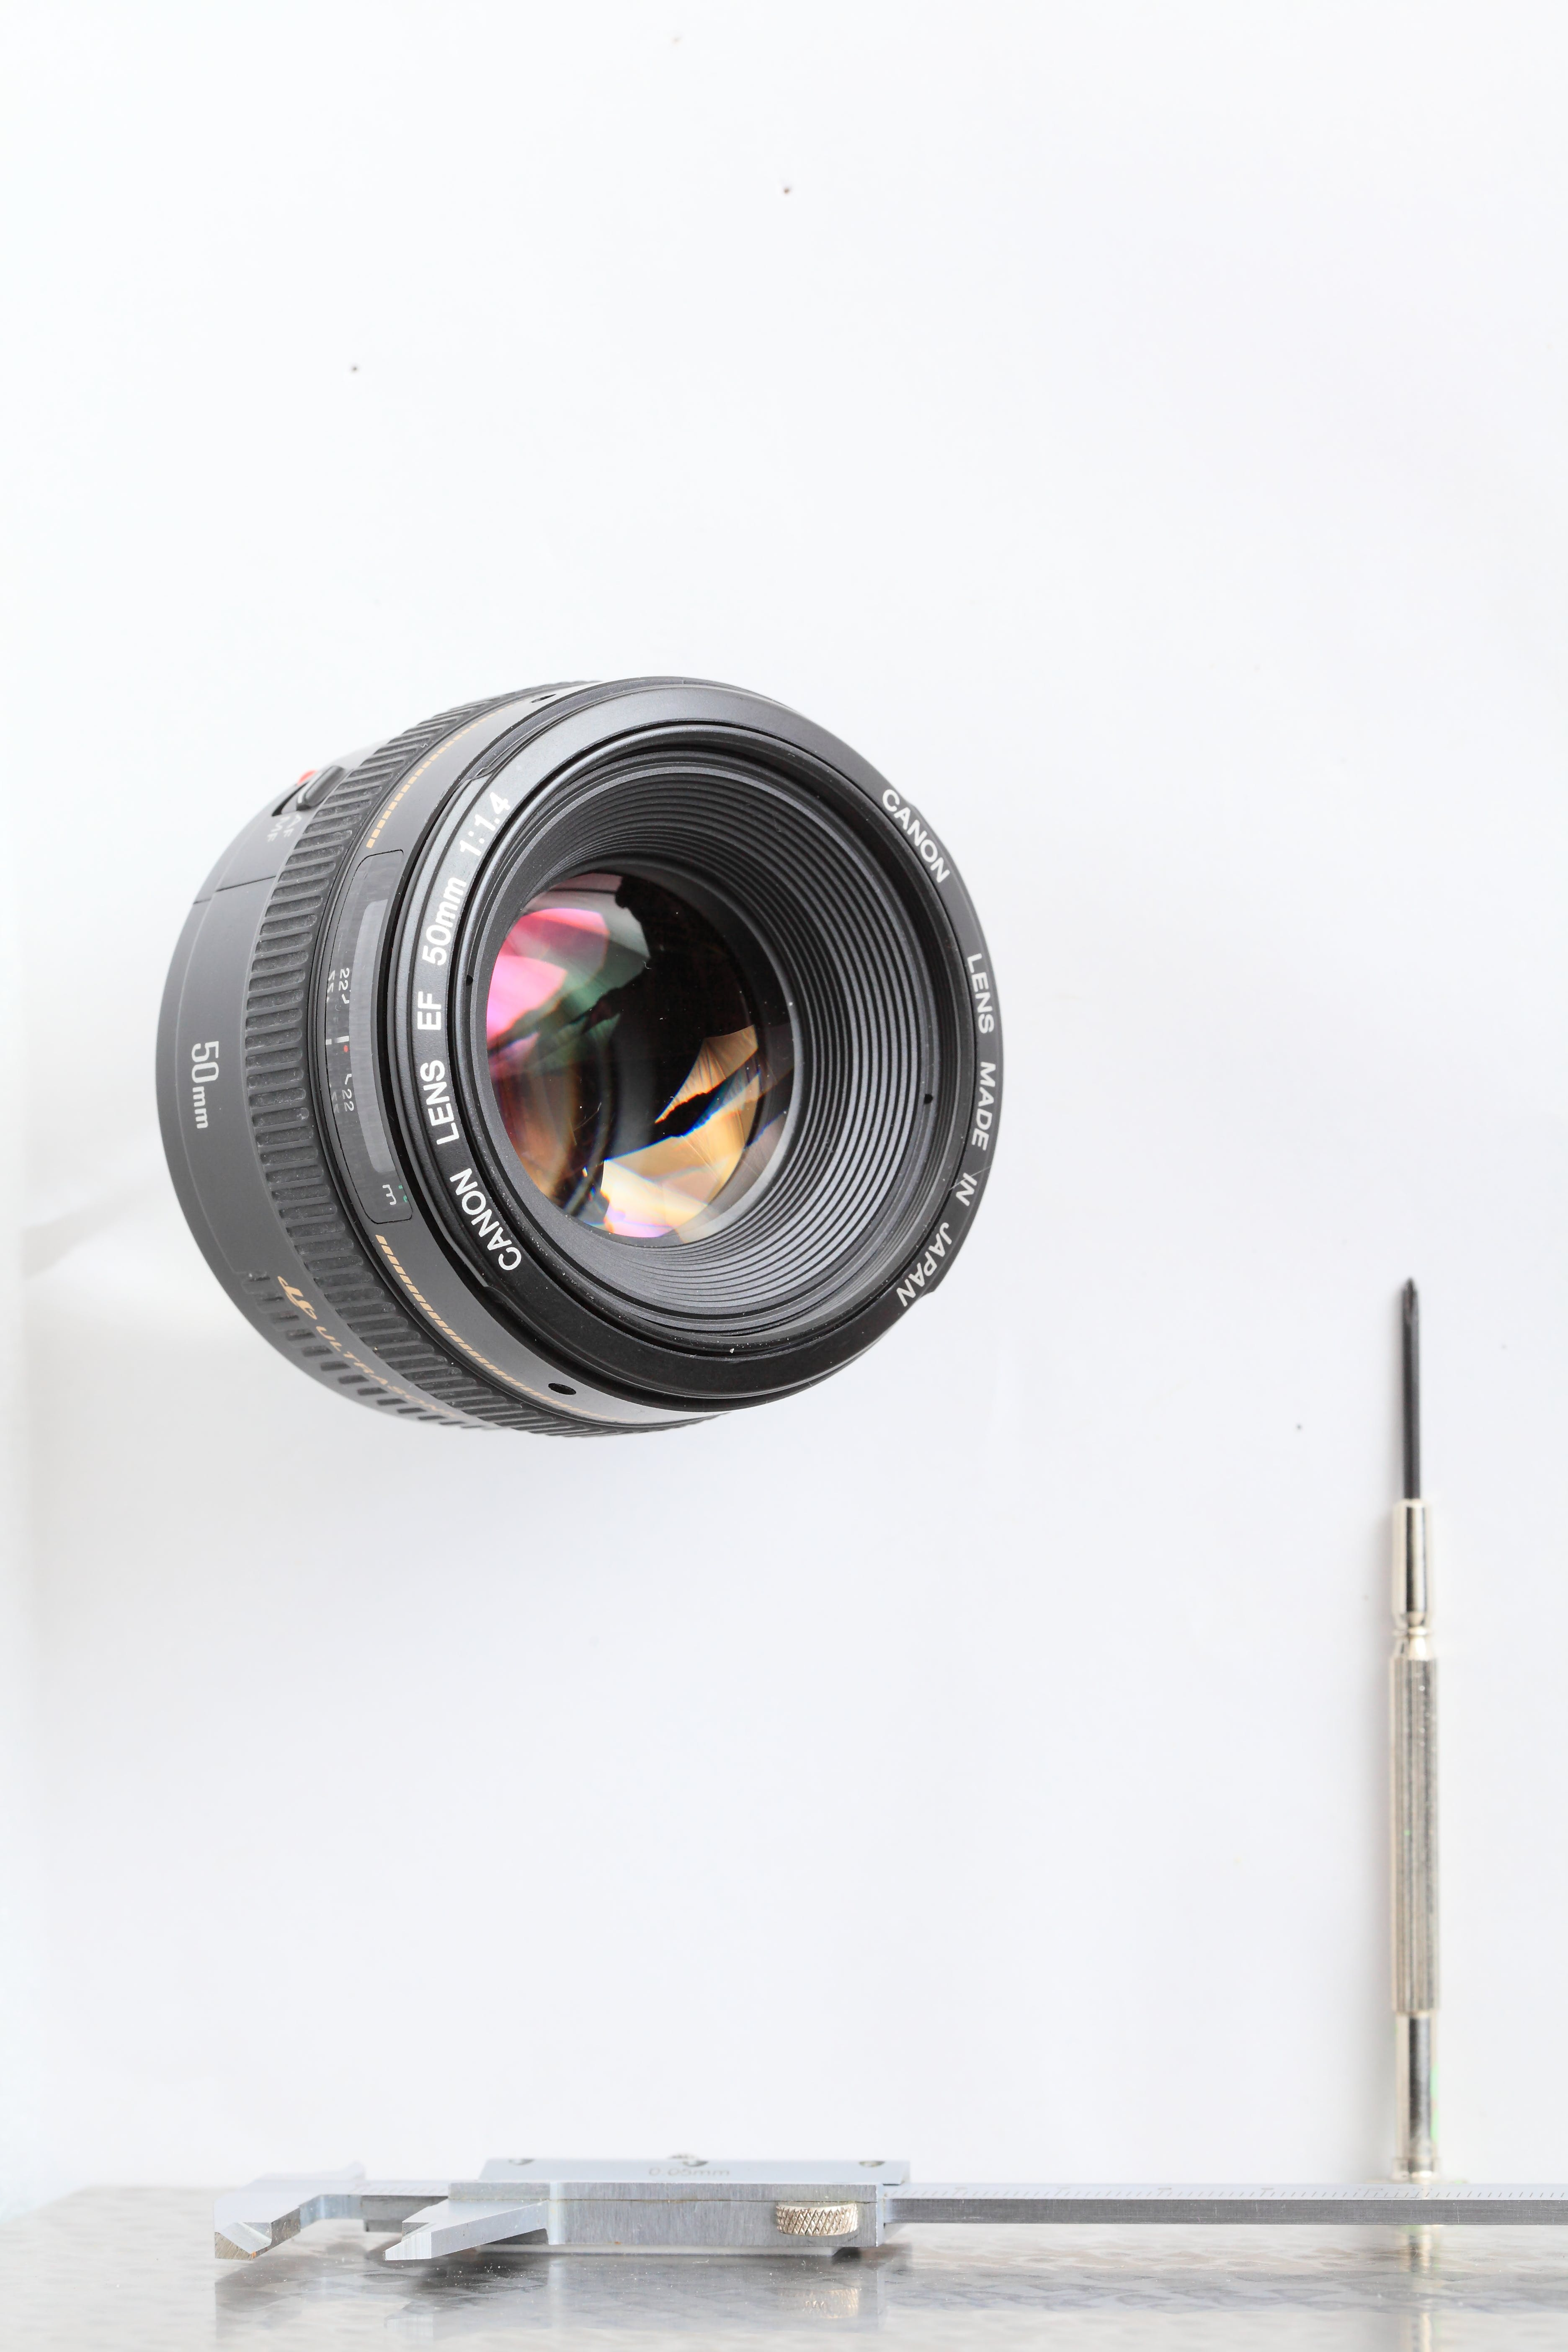 Free stock photo of lens, white, canon, driver